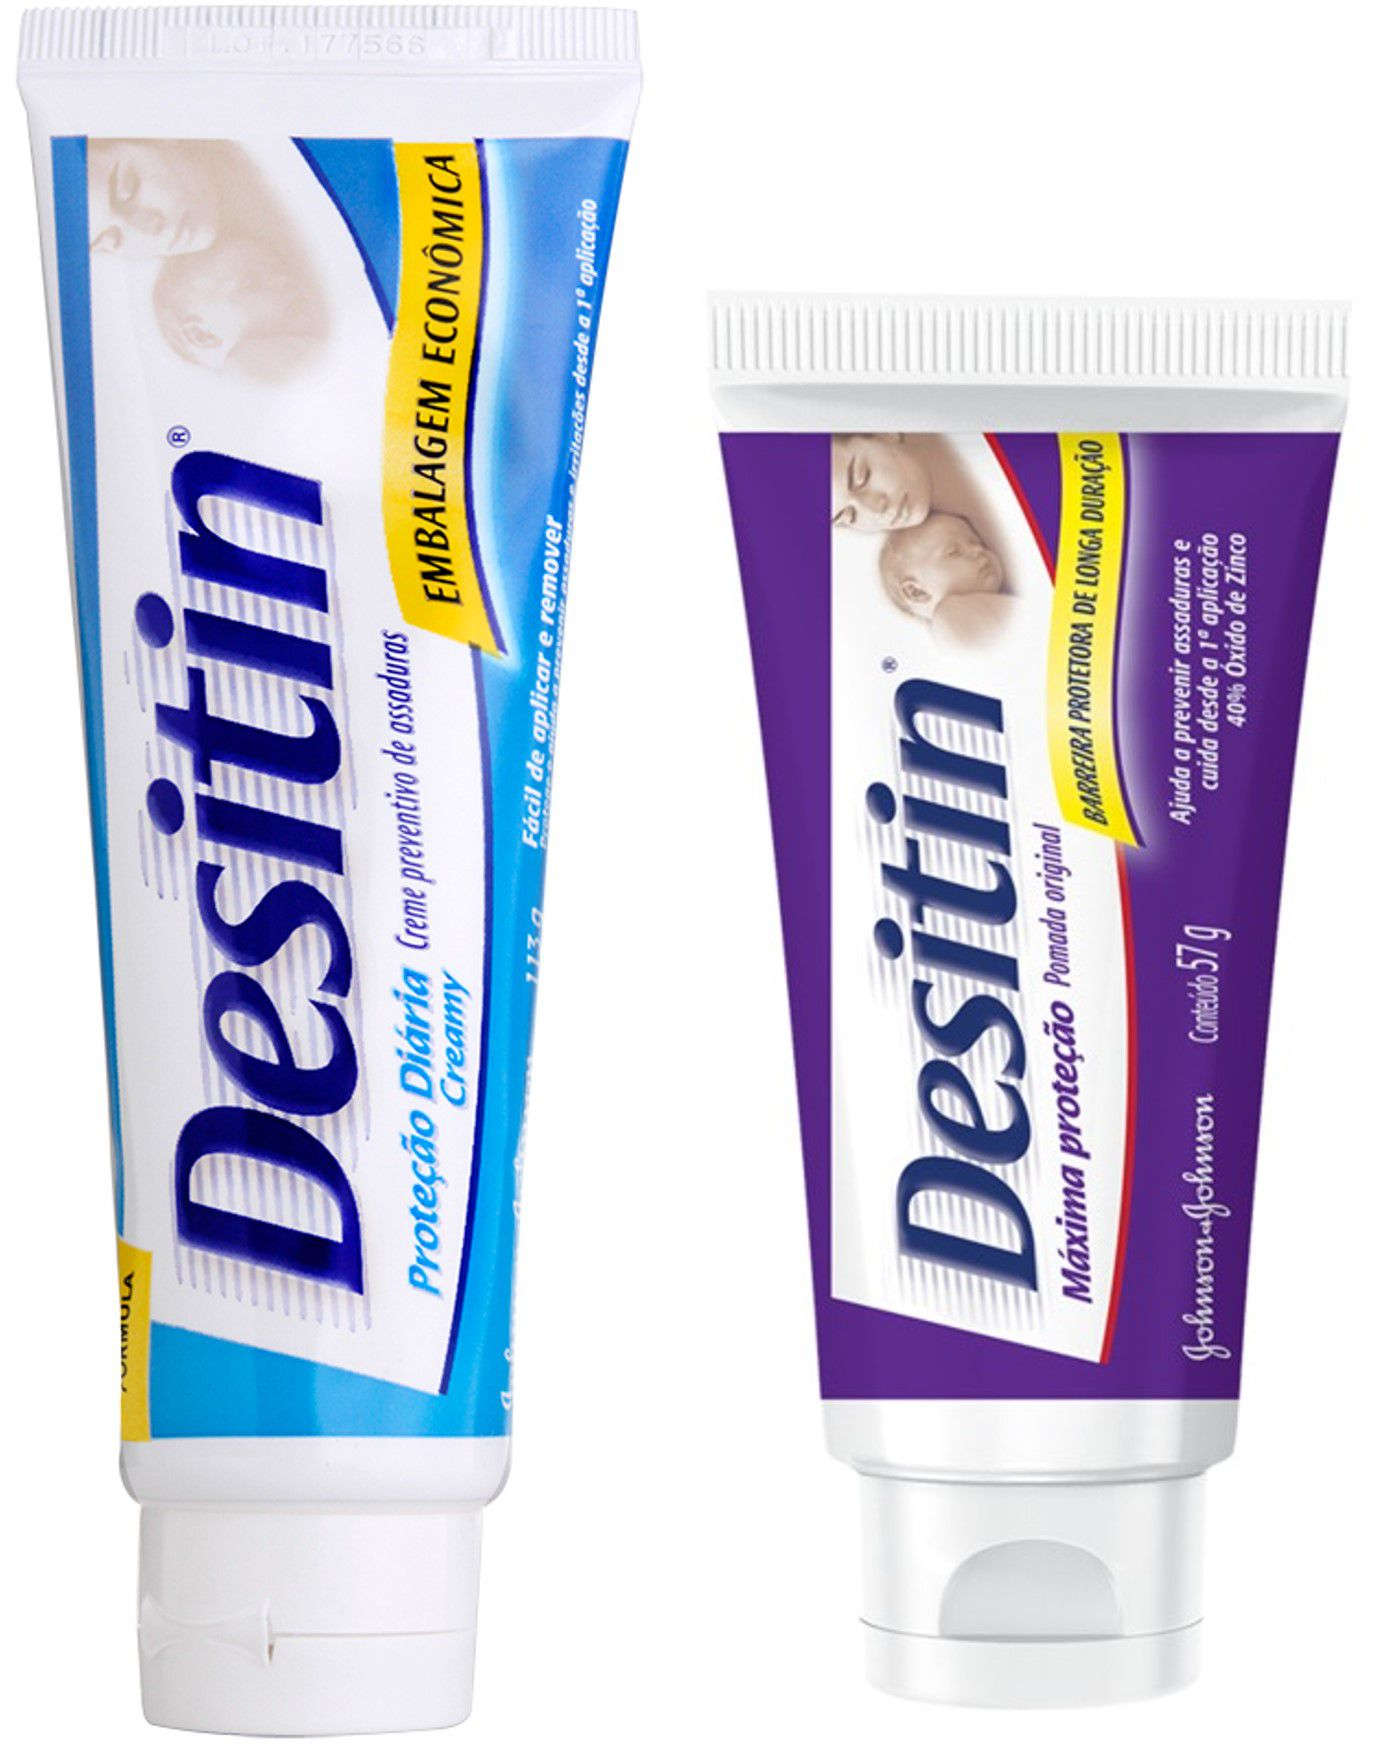 kit Desitin Creamy 113g + Desitin Máxima Duração 57g